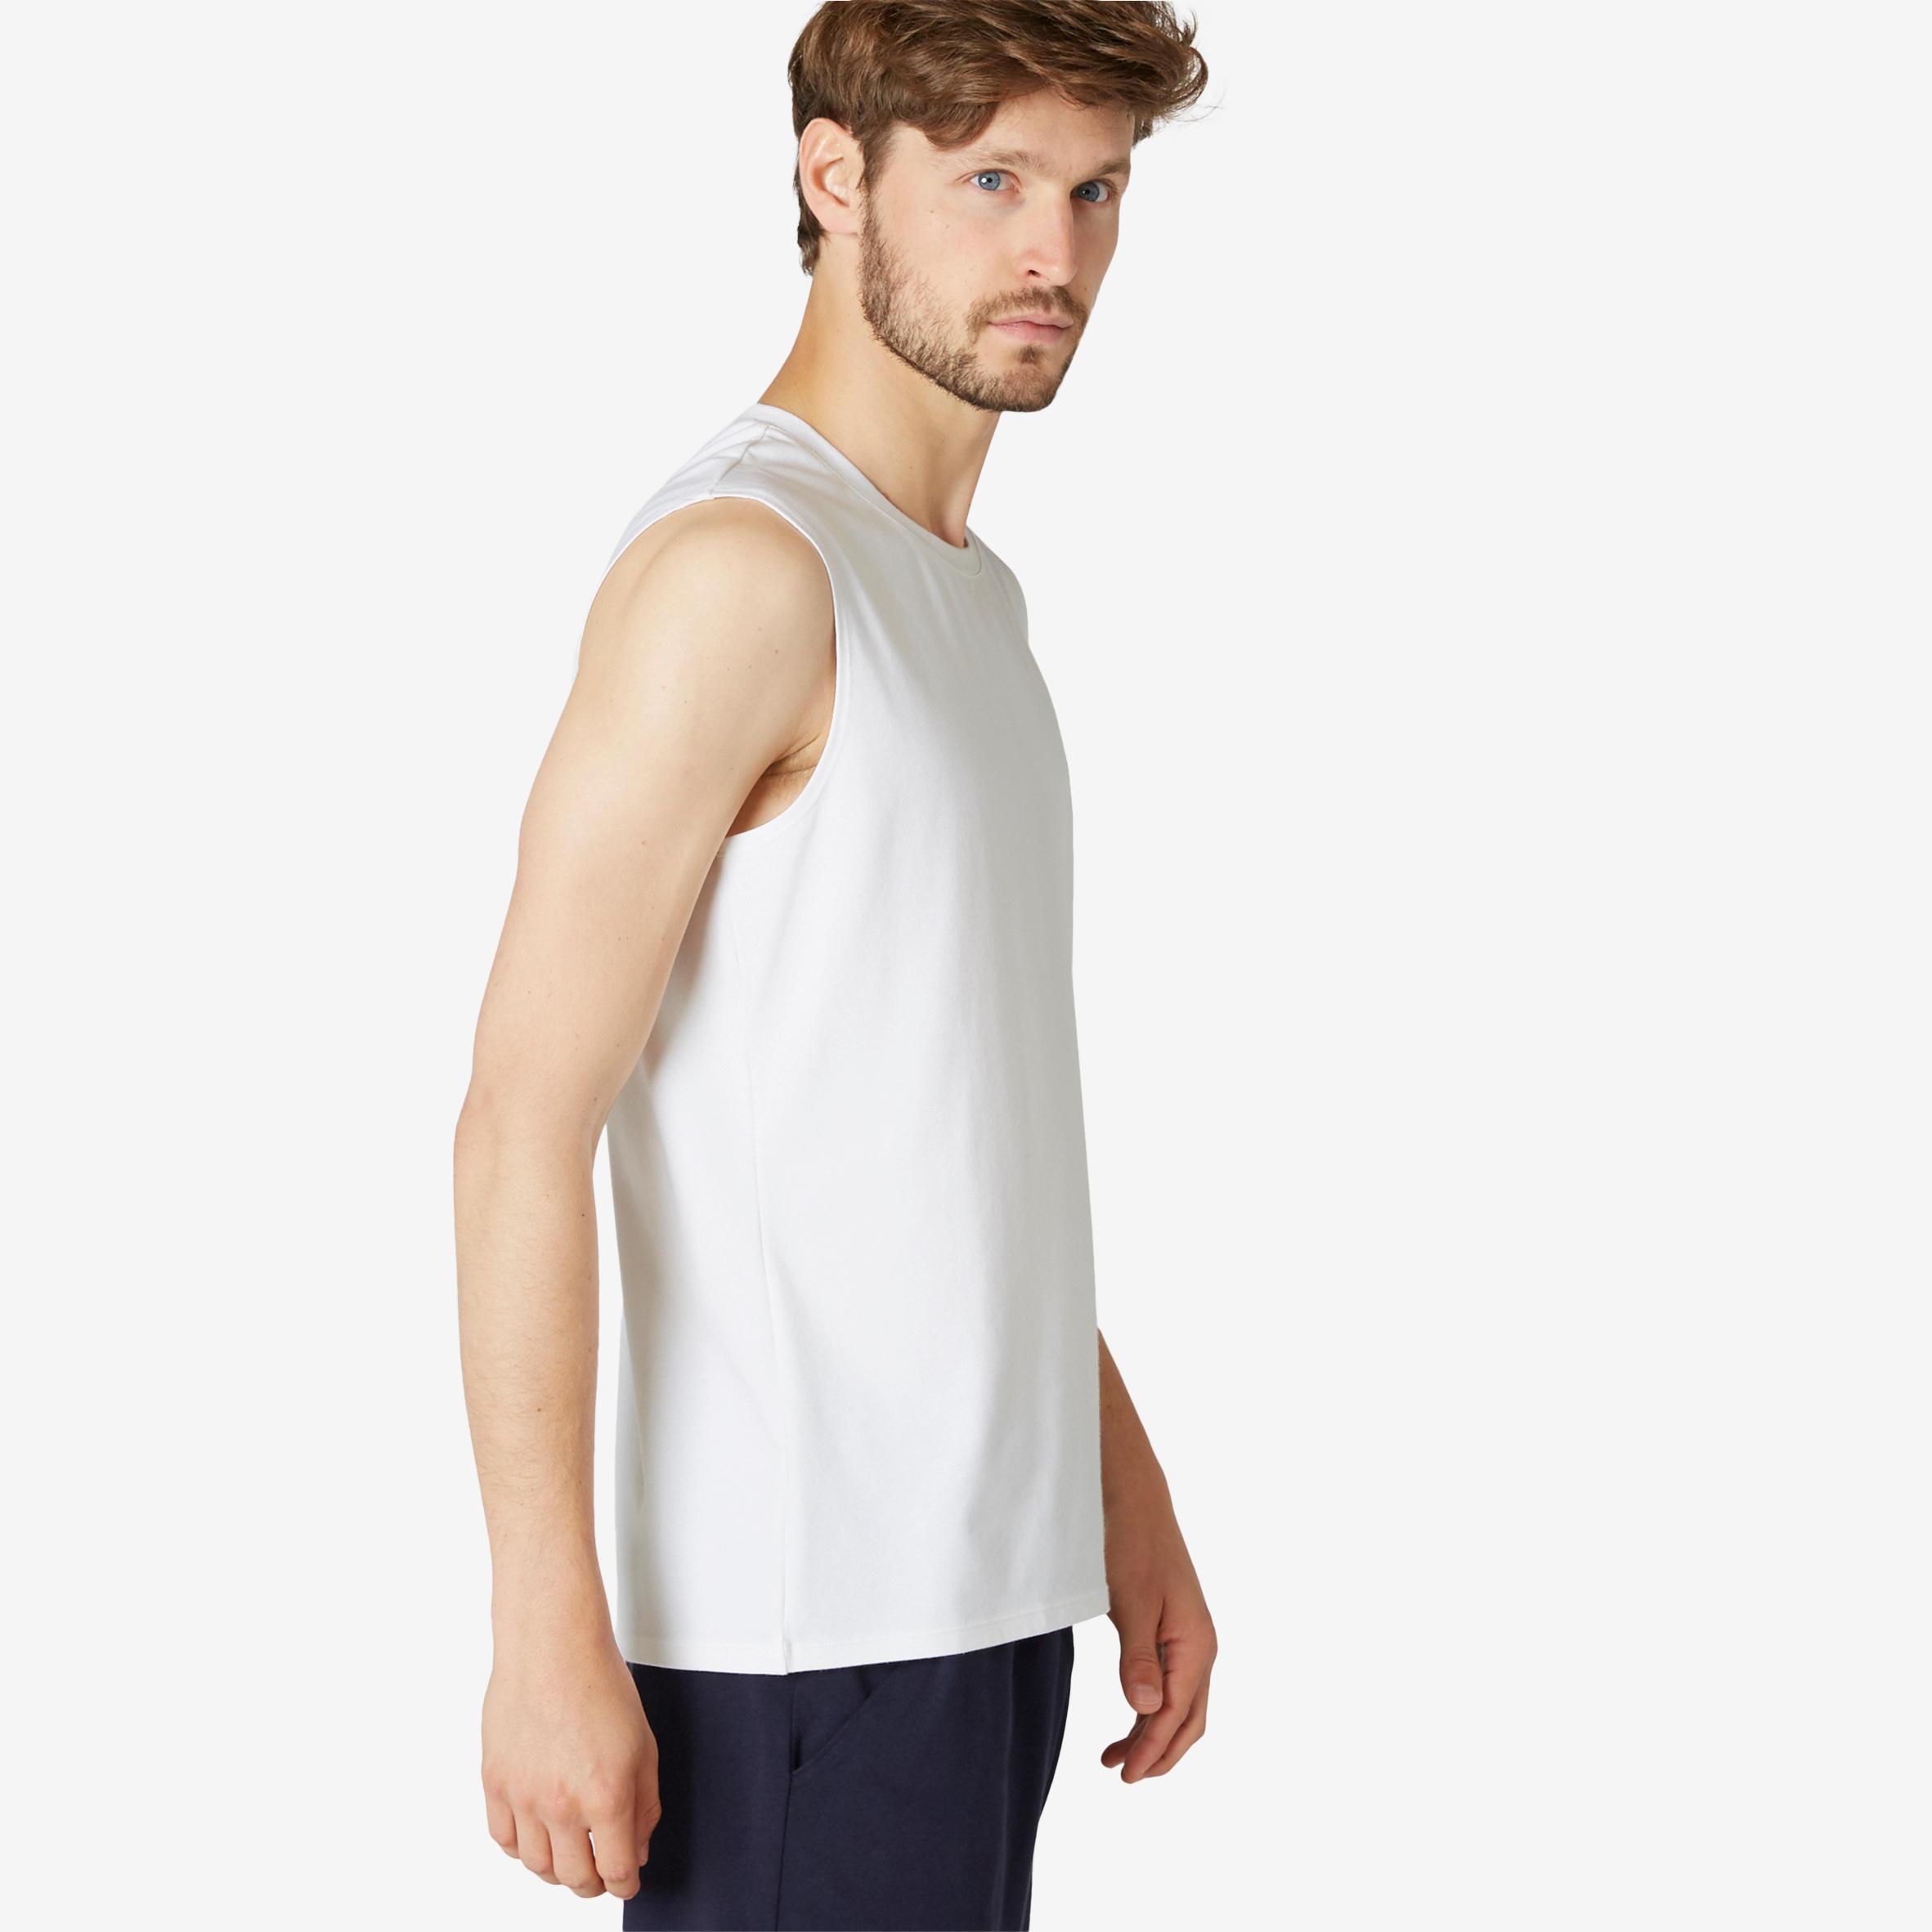 Débardeur sport pilates gym douce homme 500 regular blanc domyos